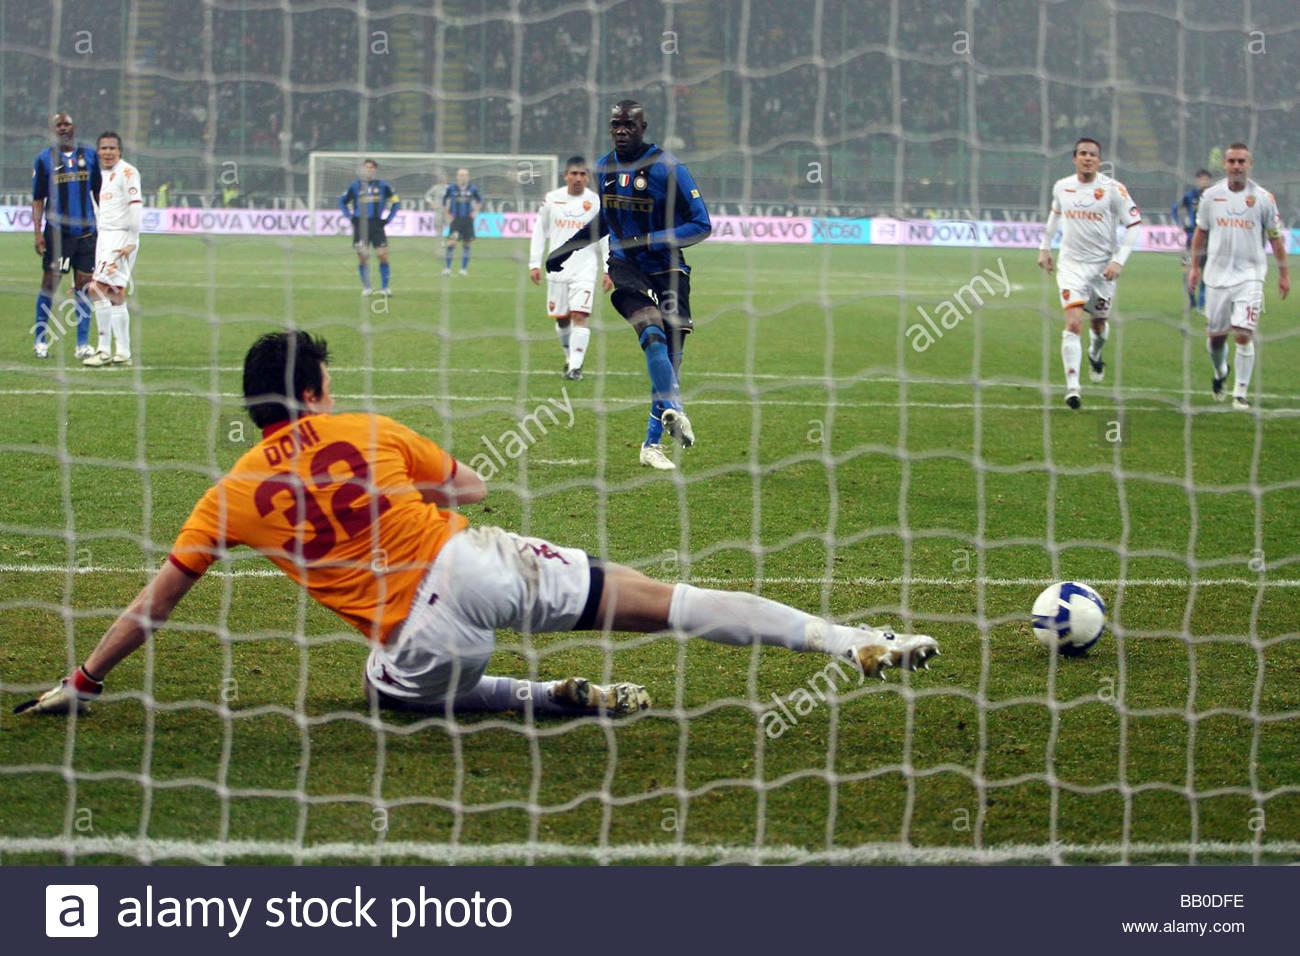 mario balotelli scores the penalty,milano 2009,serie a football championship 2008/2009,inter-roma - Stock Image